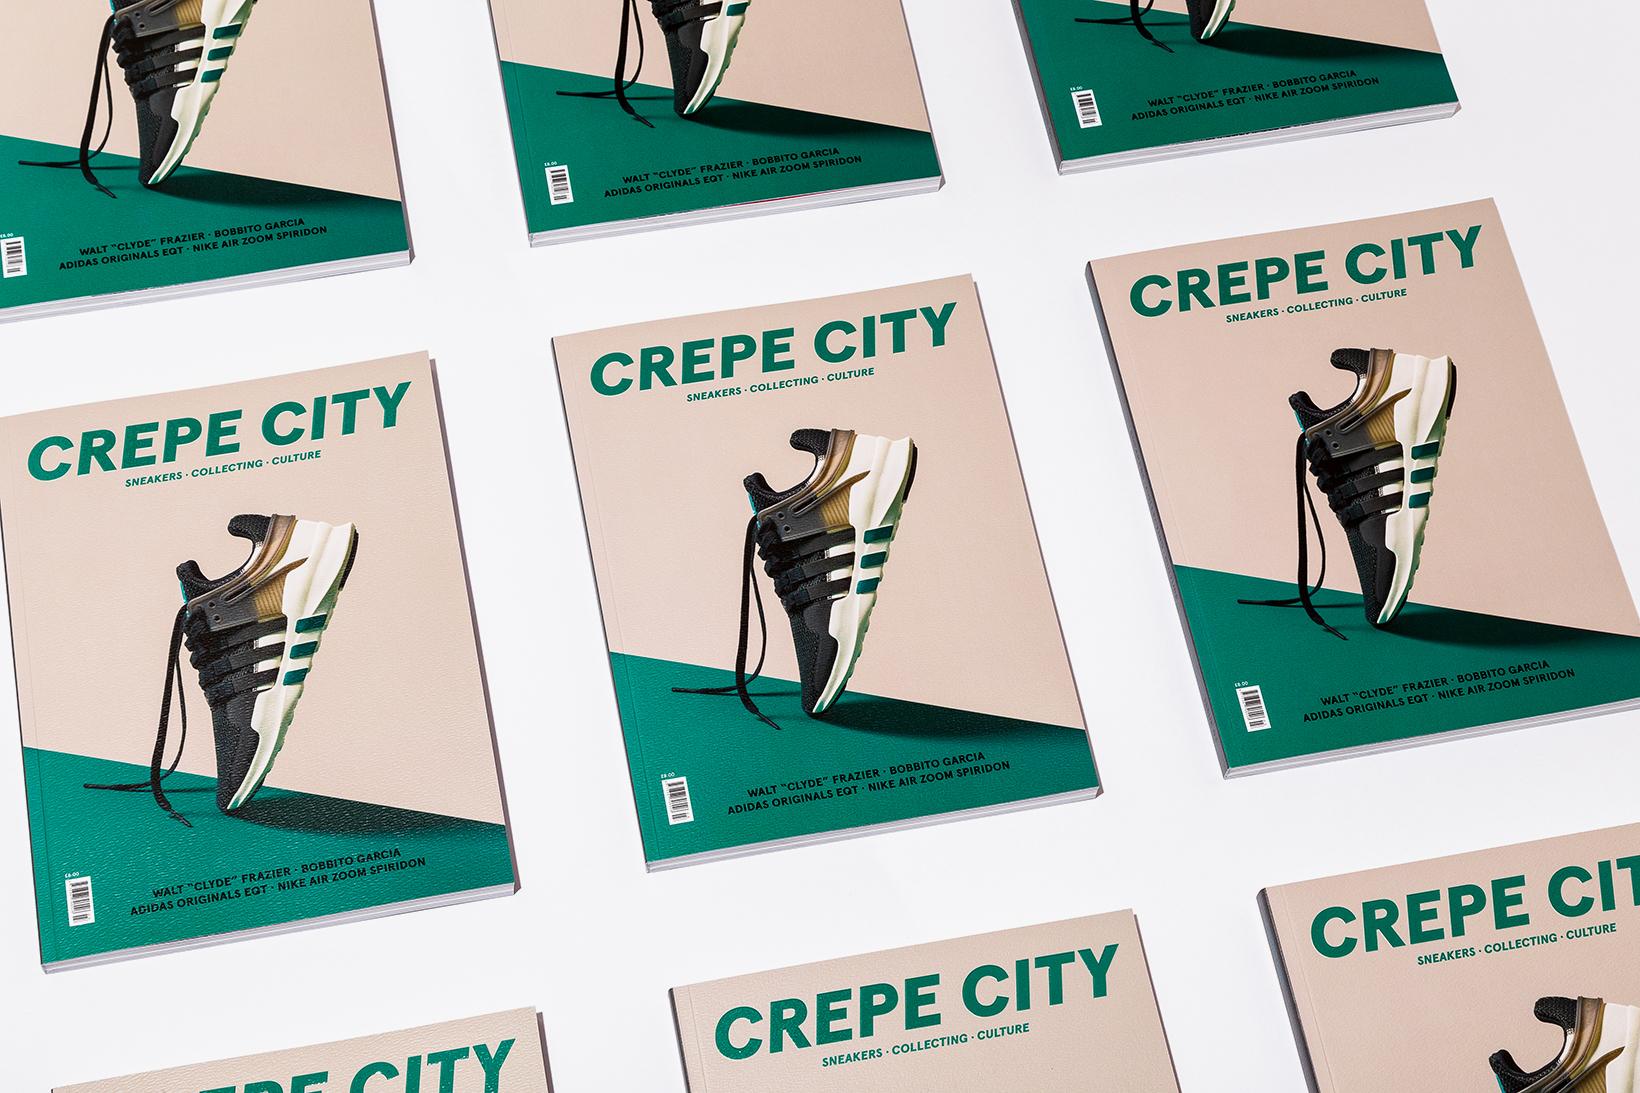 CREPE CITY Magazine Issue 03 - 1779442